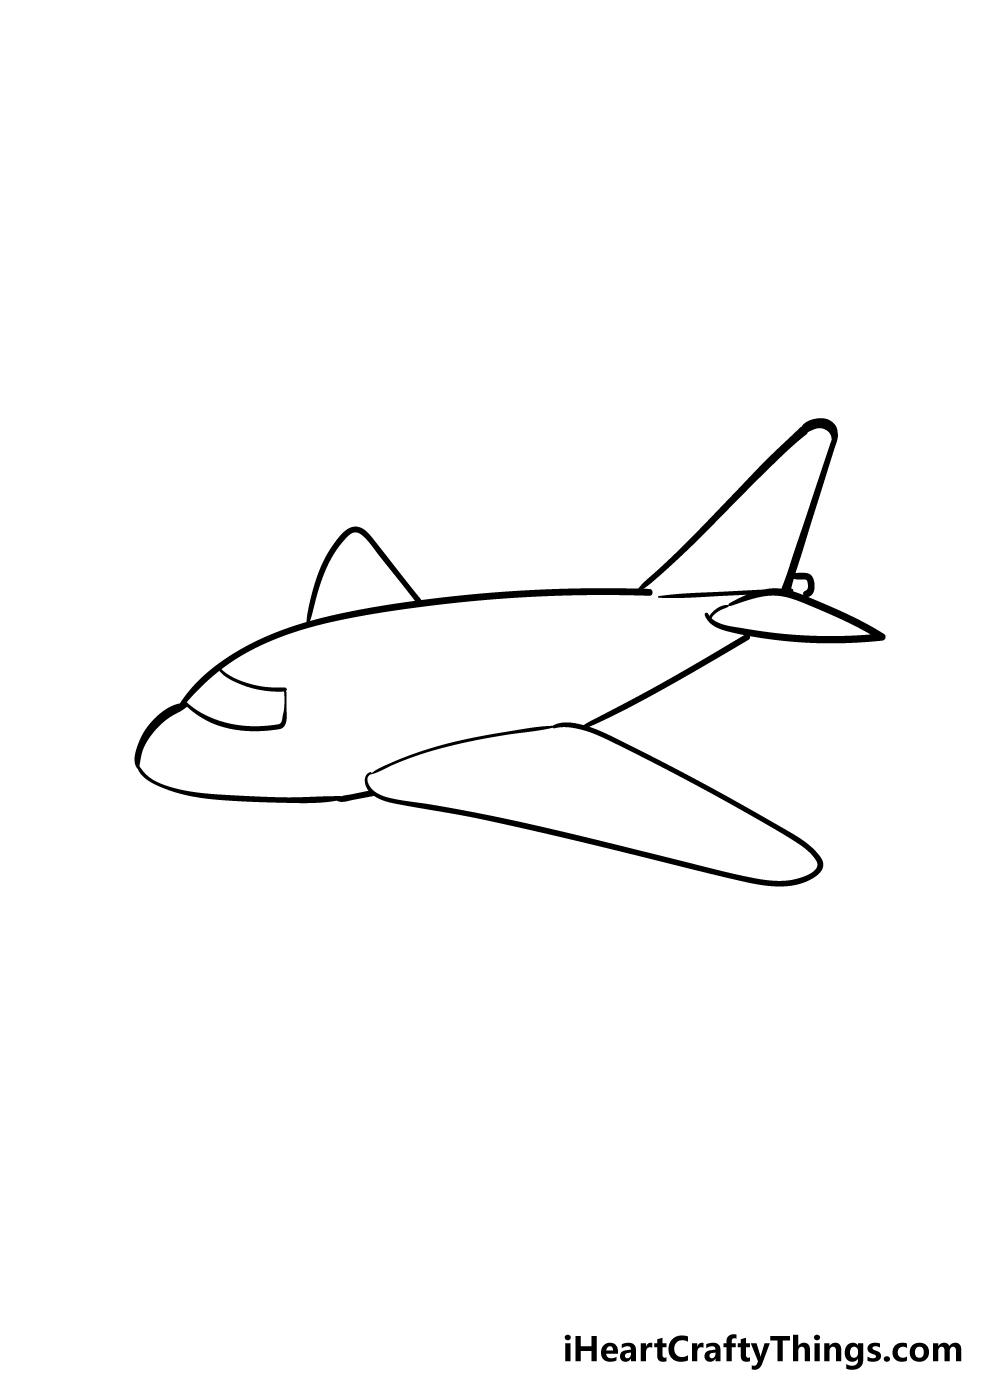 airplane drawing step 4